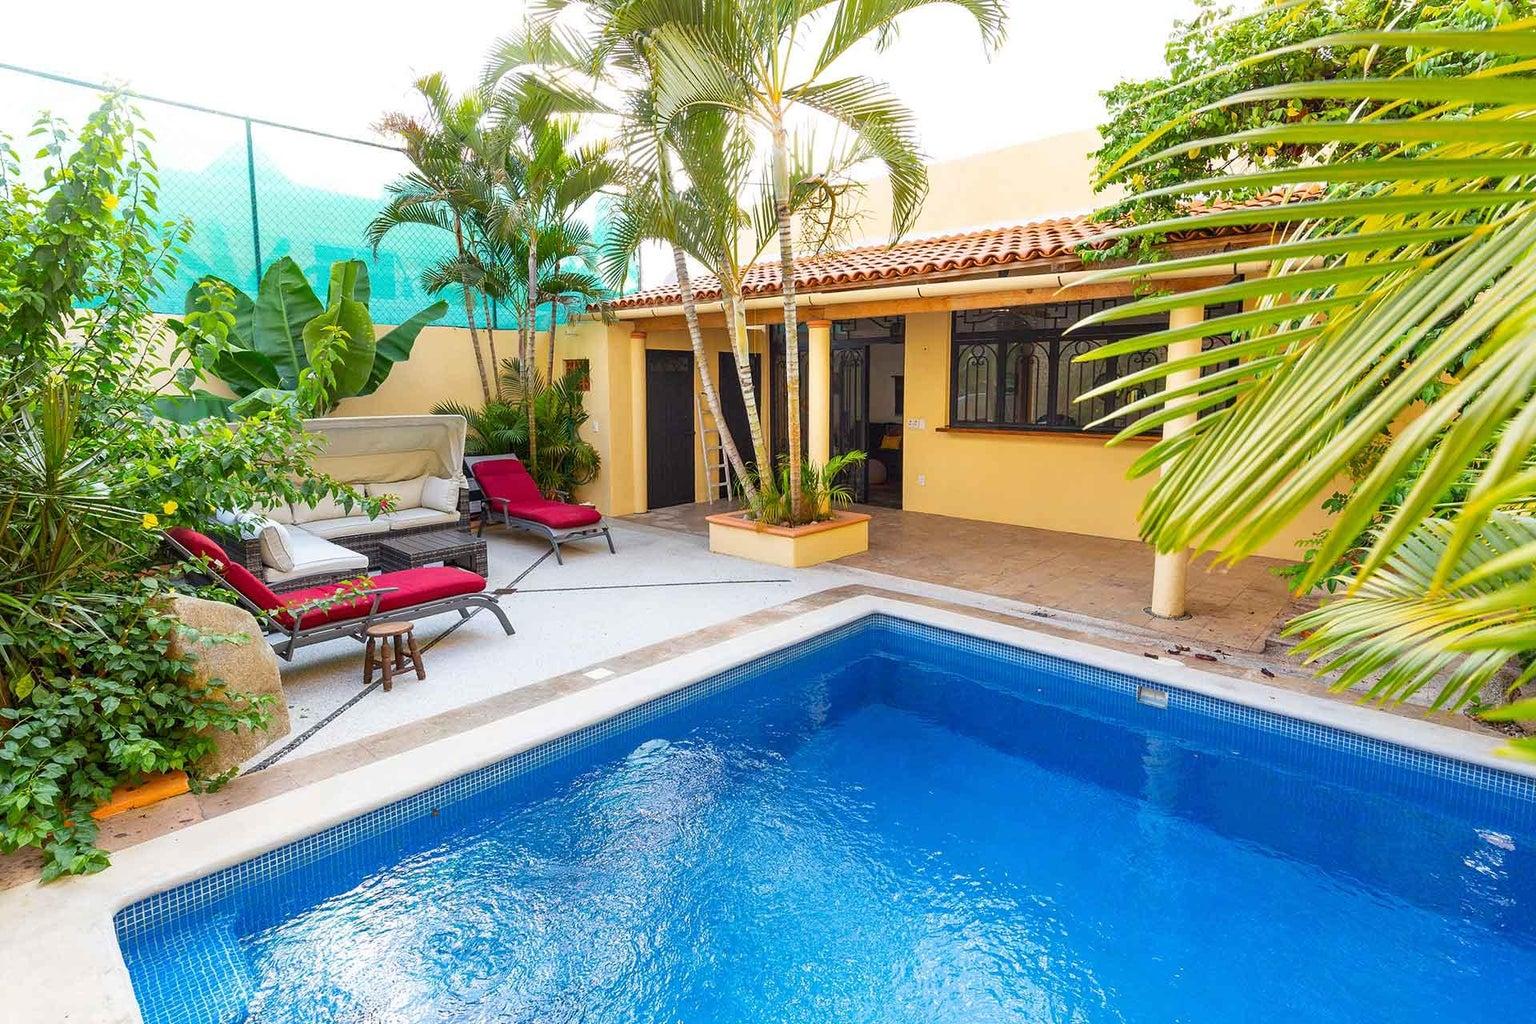 2bedroom-intown-sanpancho-mexico-amorosa